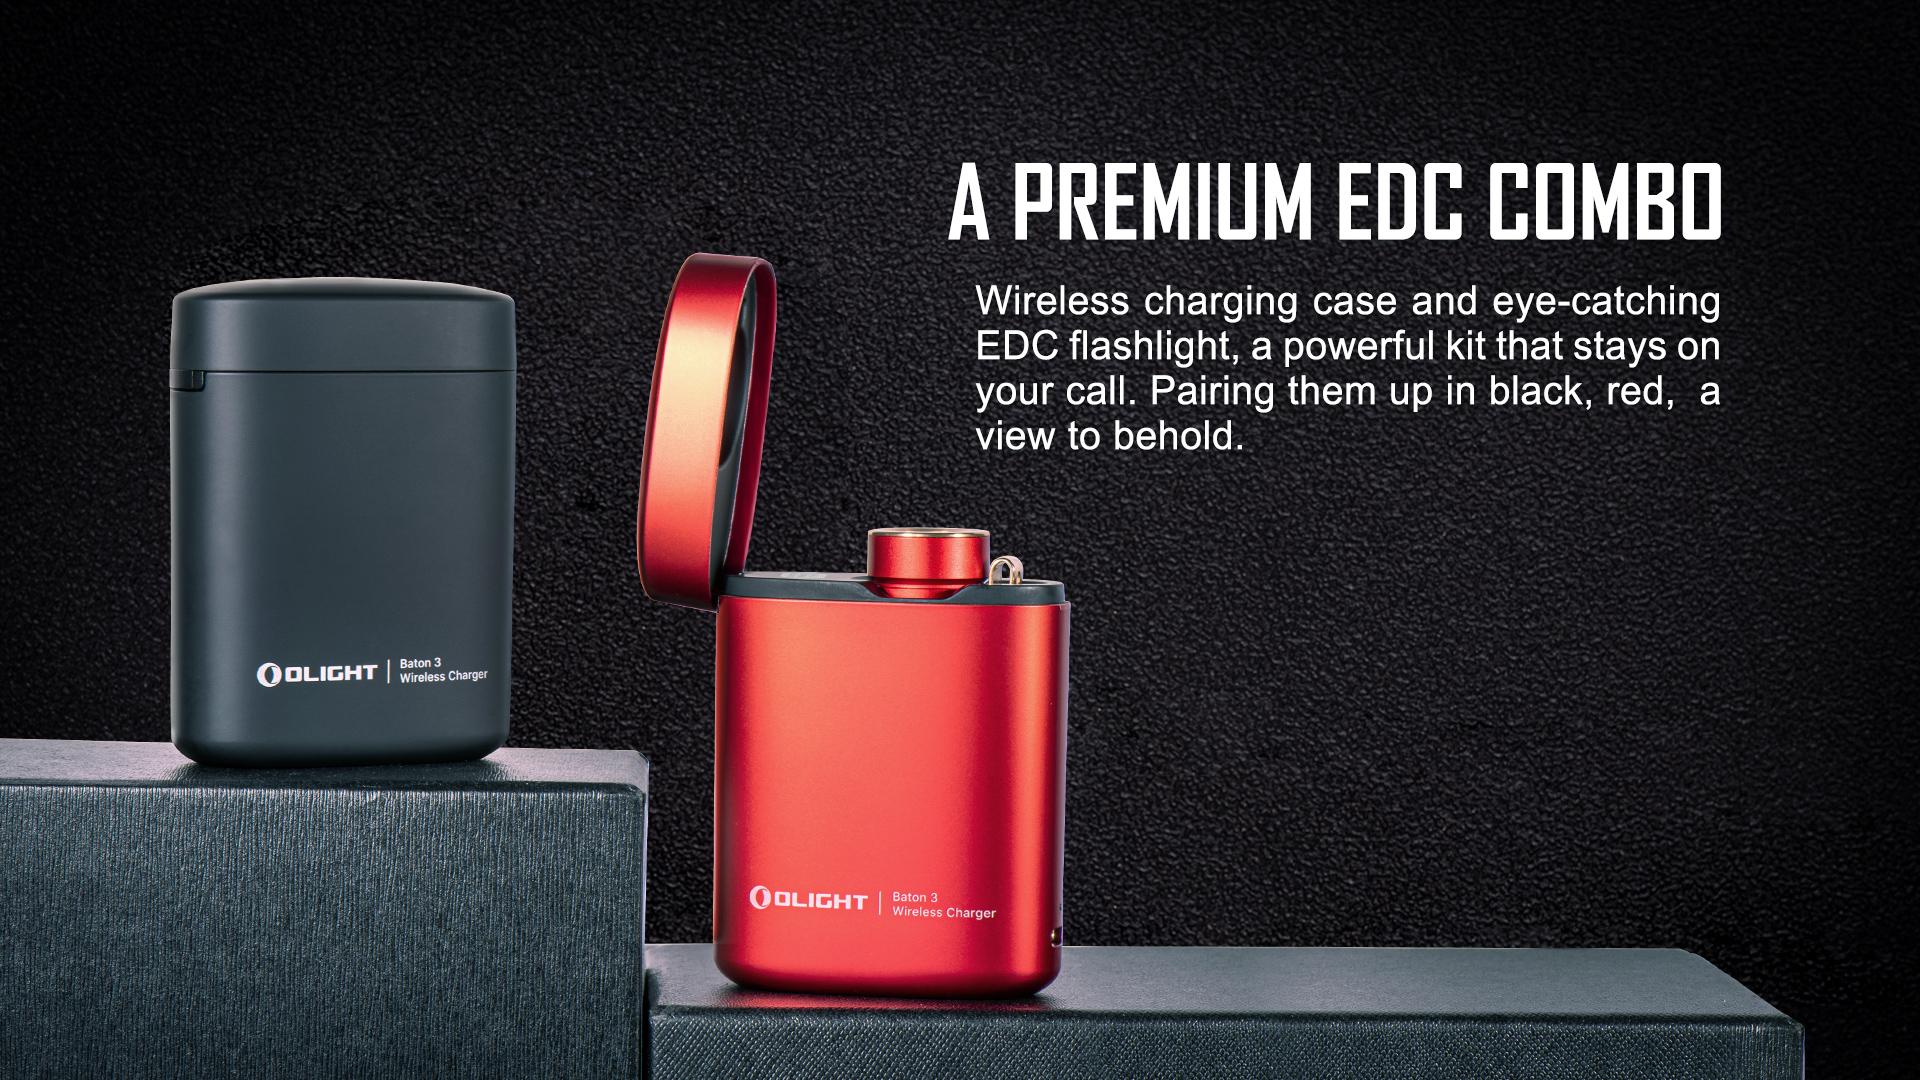 Olight Baton 3 Rechargeable LED Premium Combo